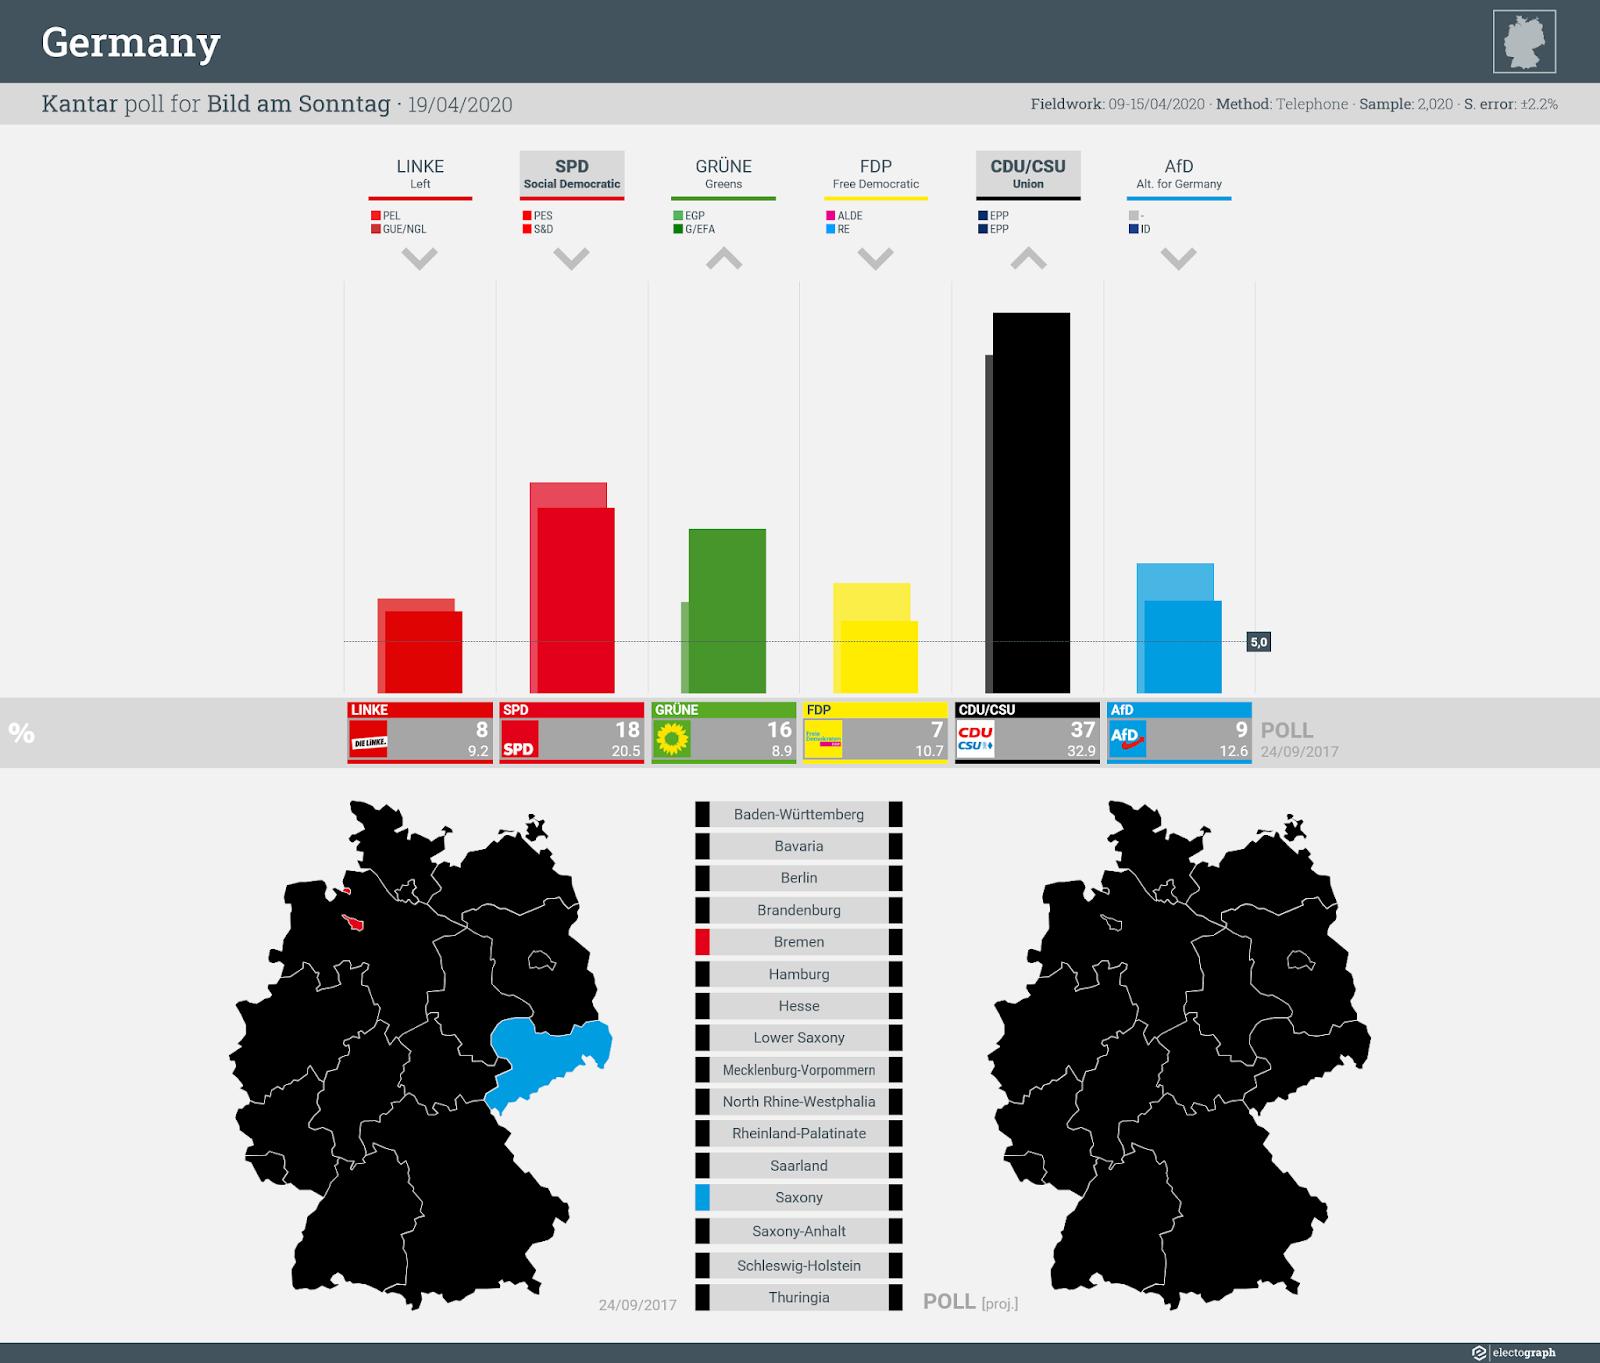 GERMANY: Kantar poll chart for Bild am Sonntag, 19 April 2020